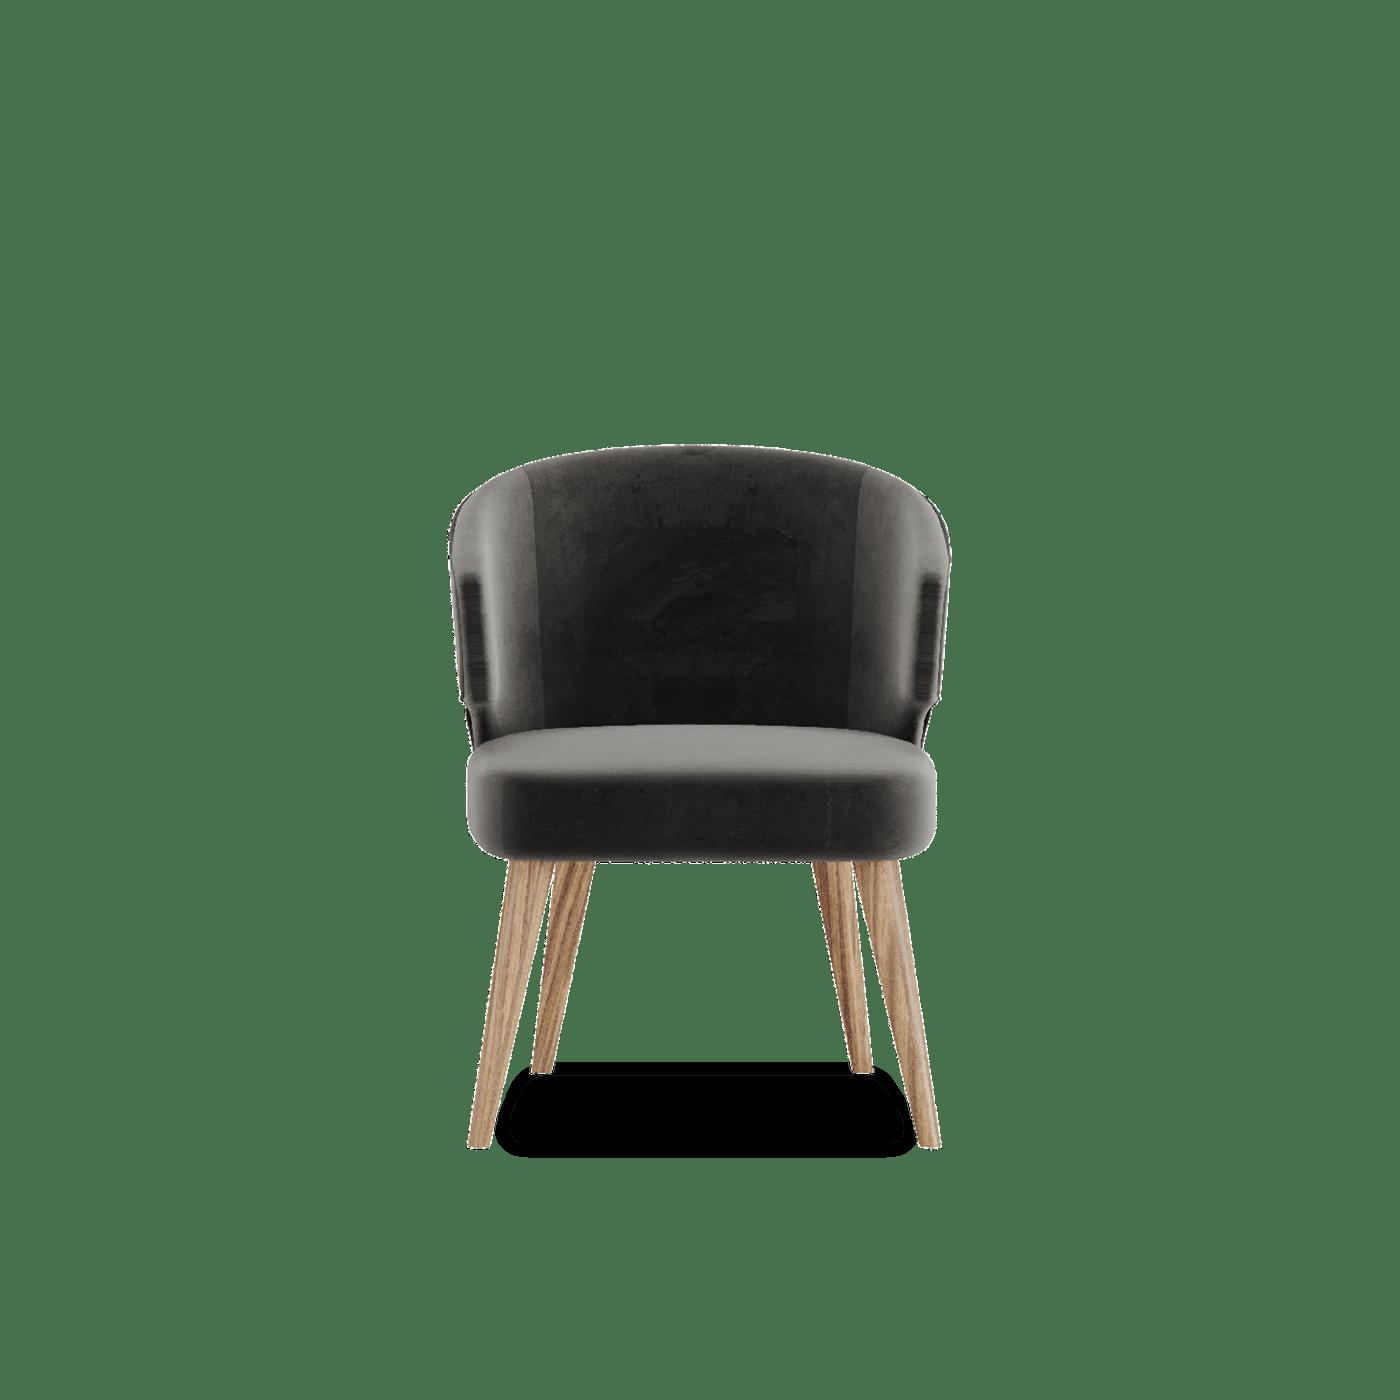 Fargo chair